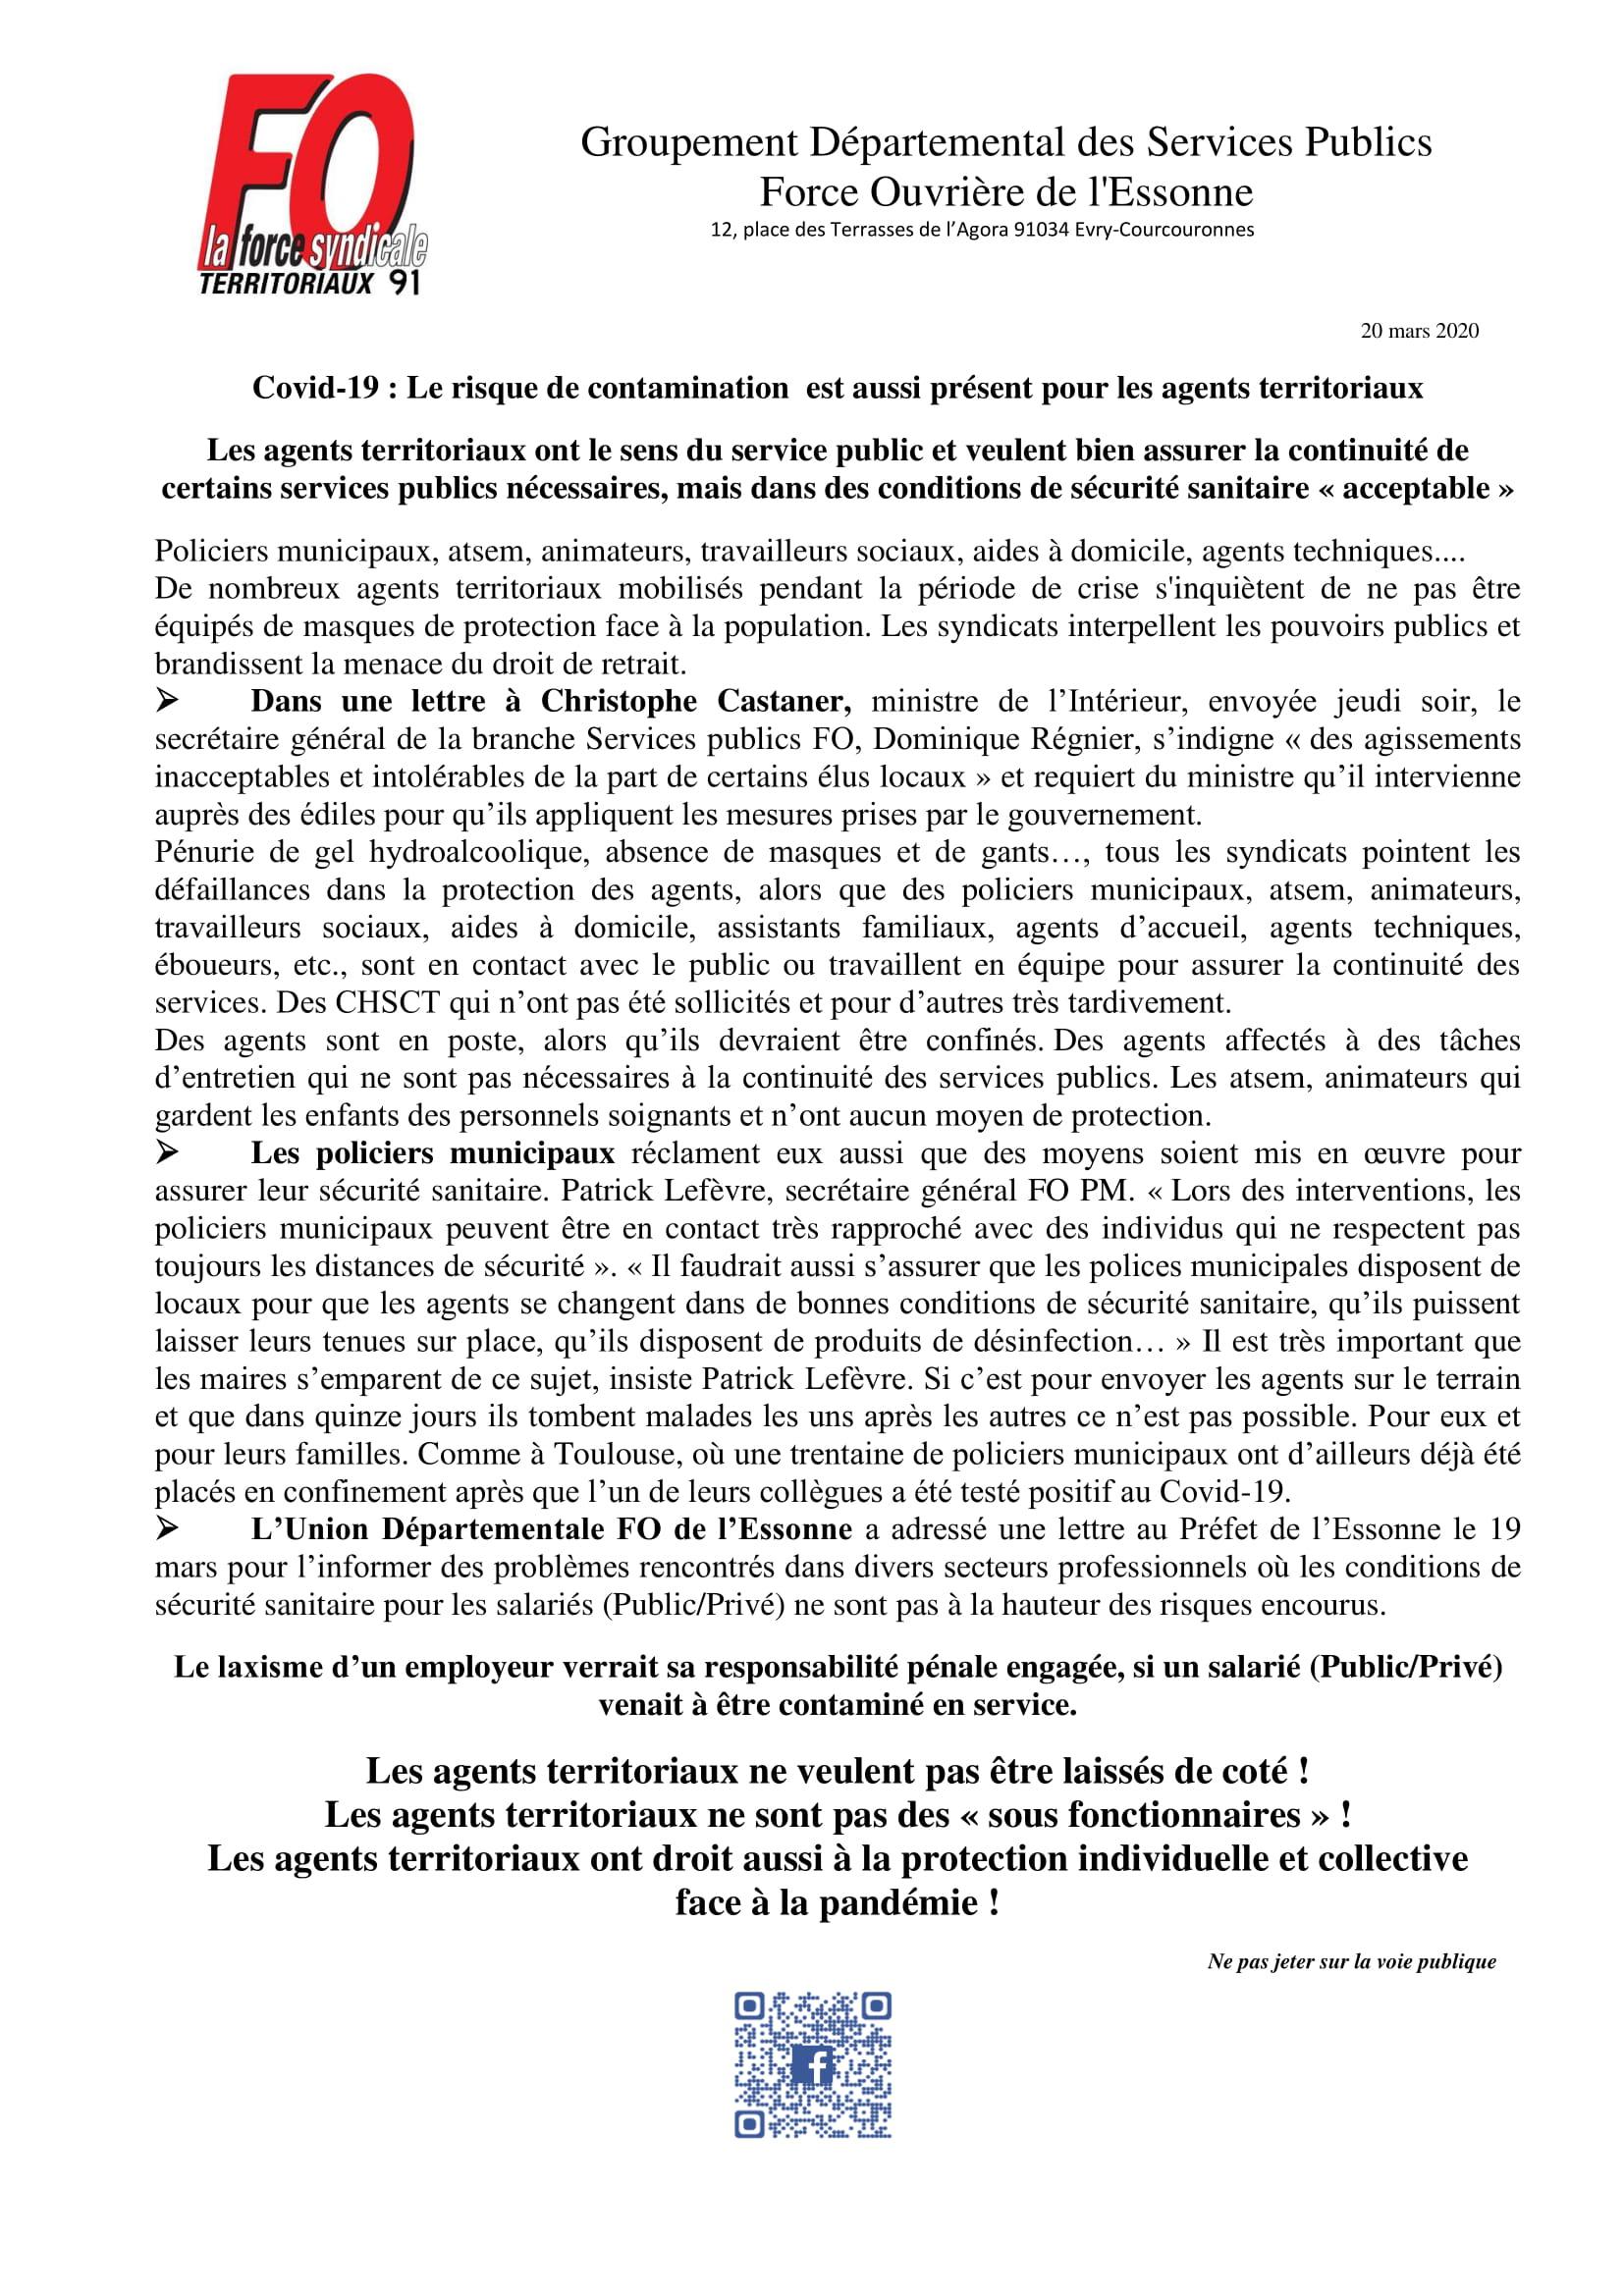 Communiqu+® GDSPFO91 20-03-2020-1.jpg